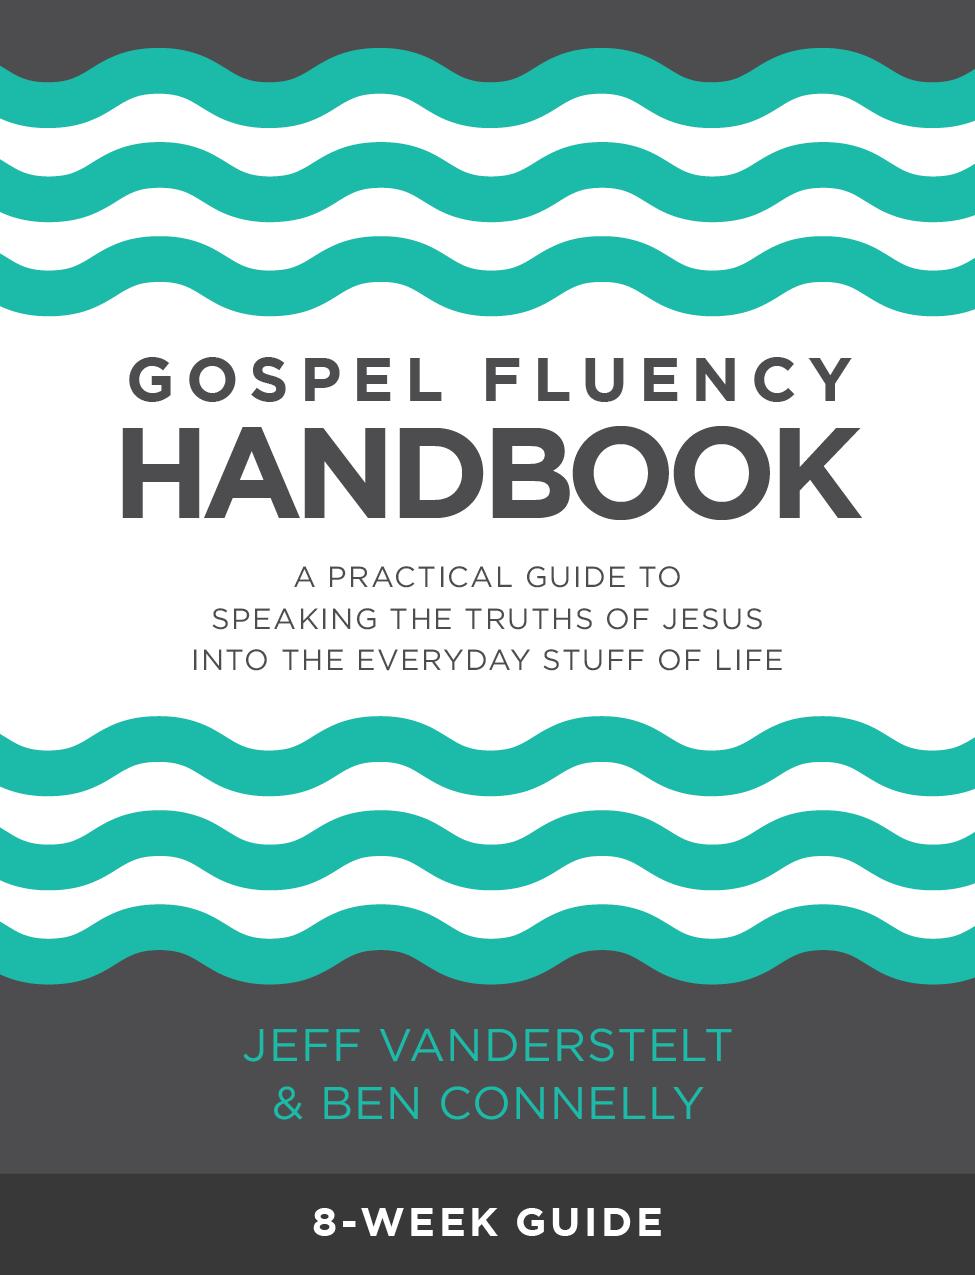 GF Handbook Cover